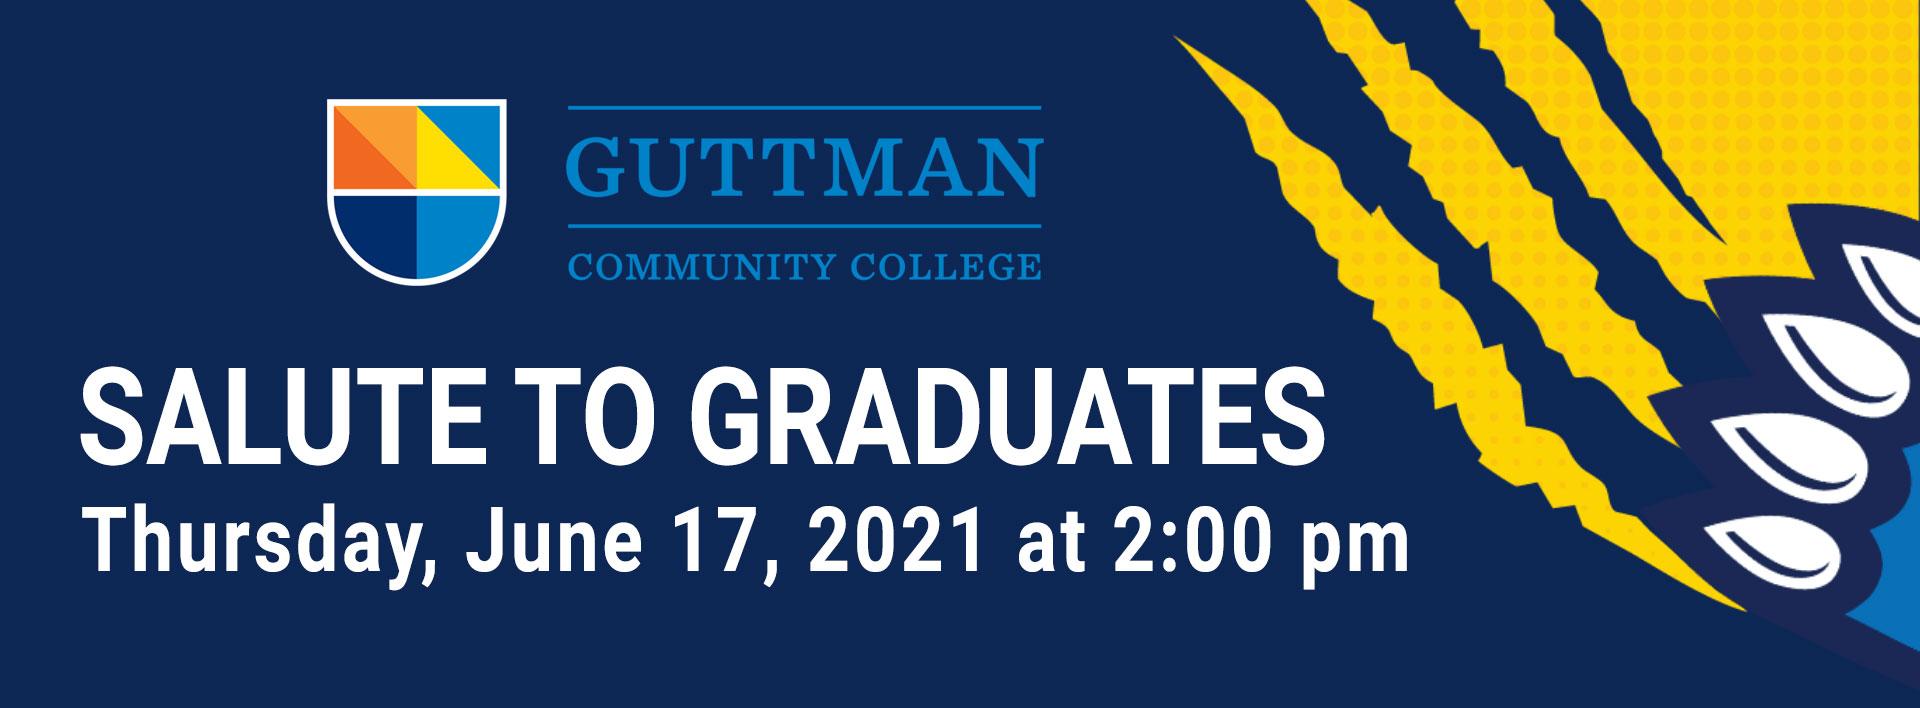 Salute to Graduates, June 17 at 2:00 pm